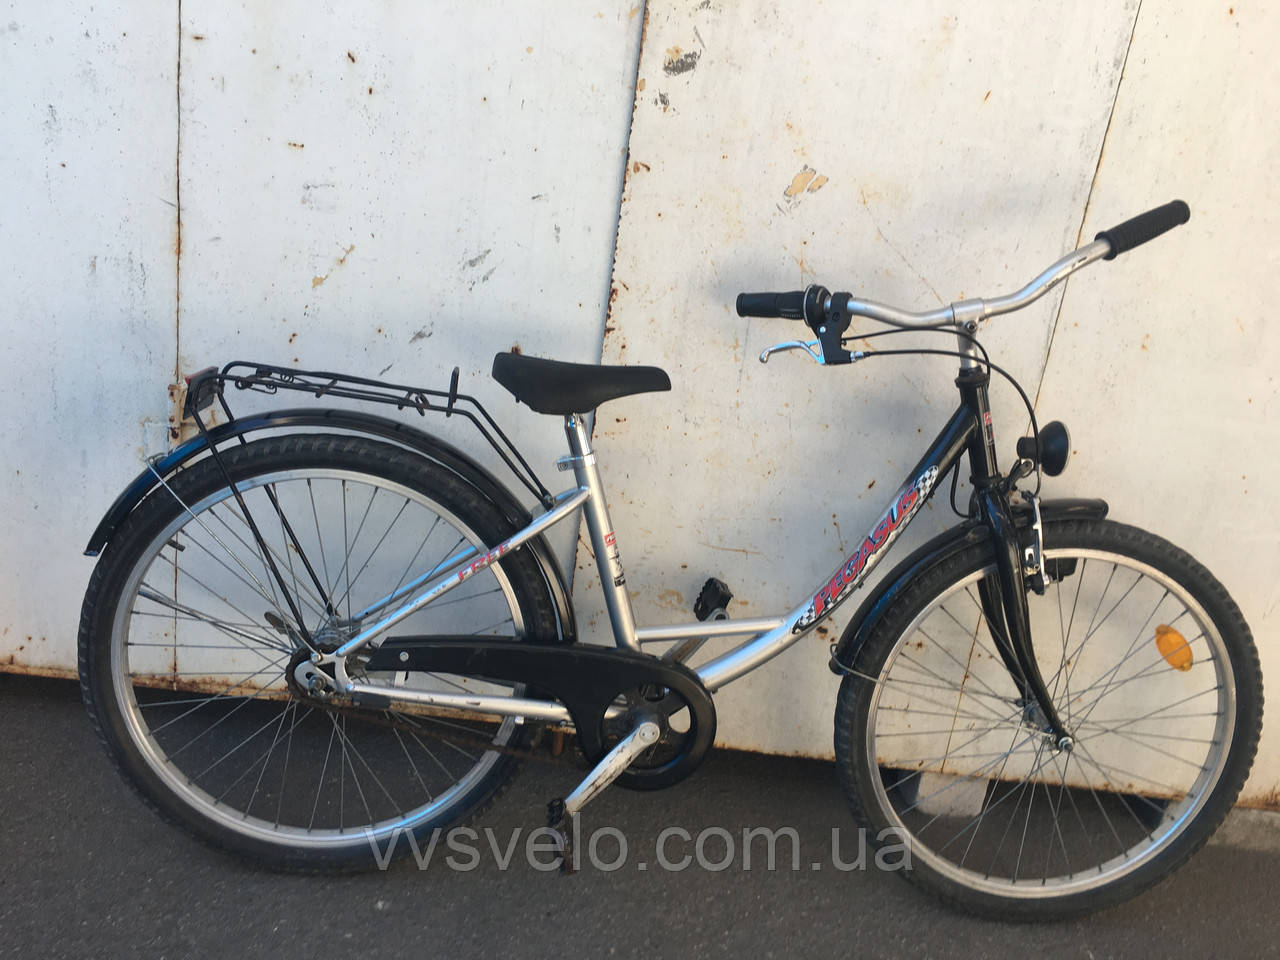 Велосипед Pegasus 24 планитарка 3 sram  бу